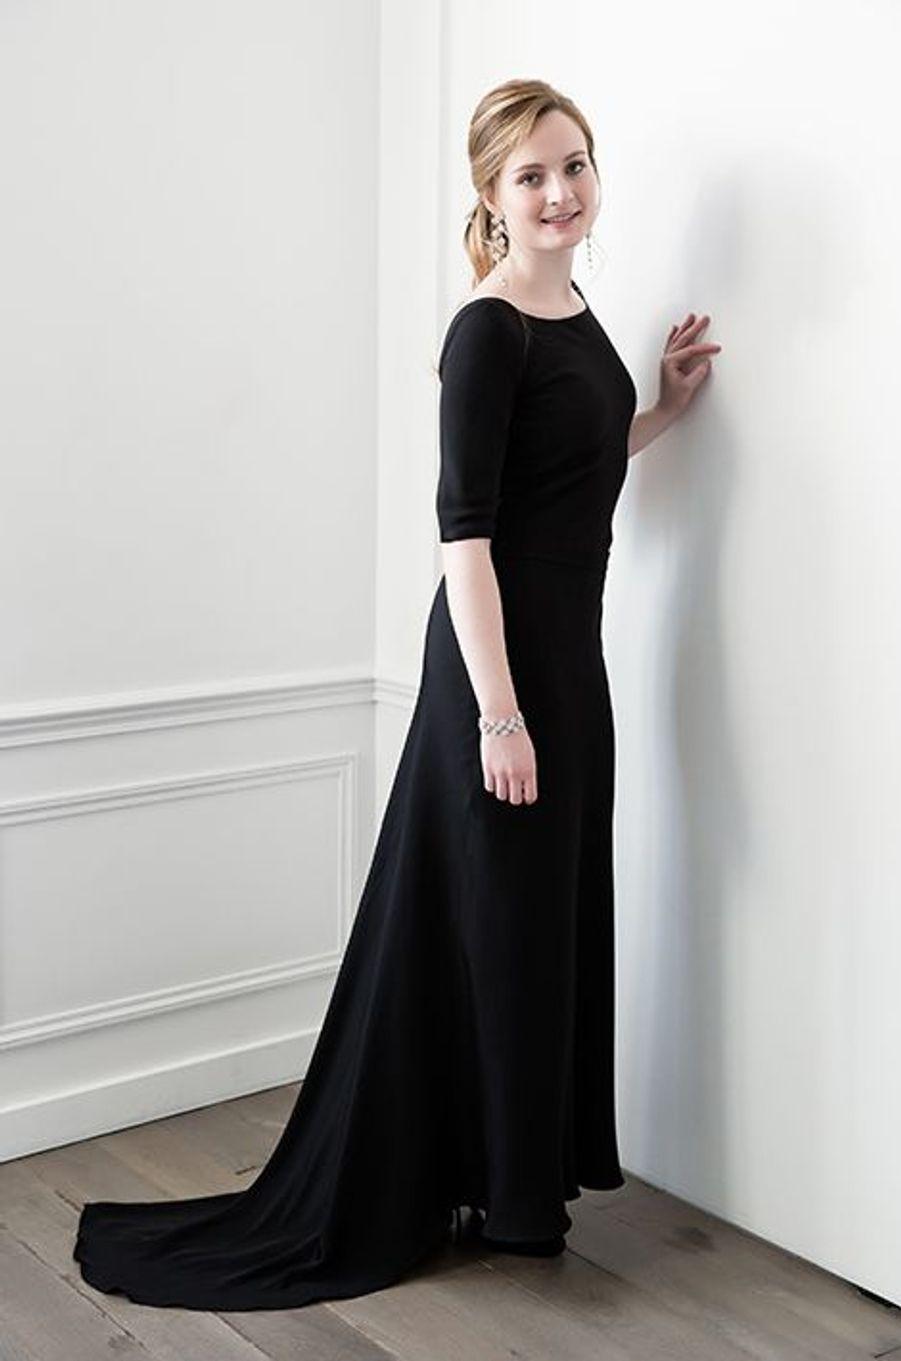 Tara Sackler-Hunt (Irlande) en robe Delphine Manivet, bijoux Payal New York